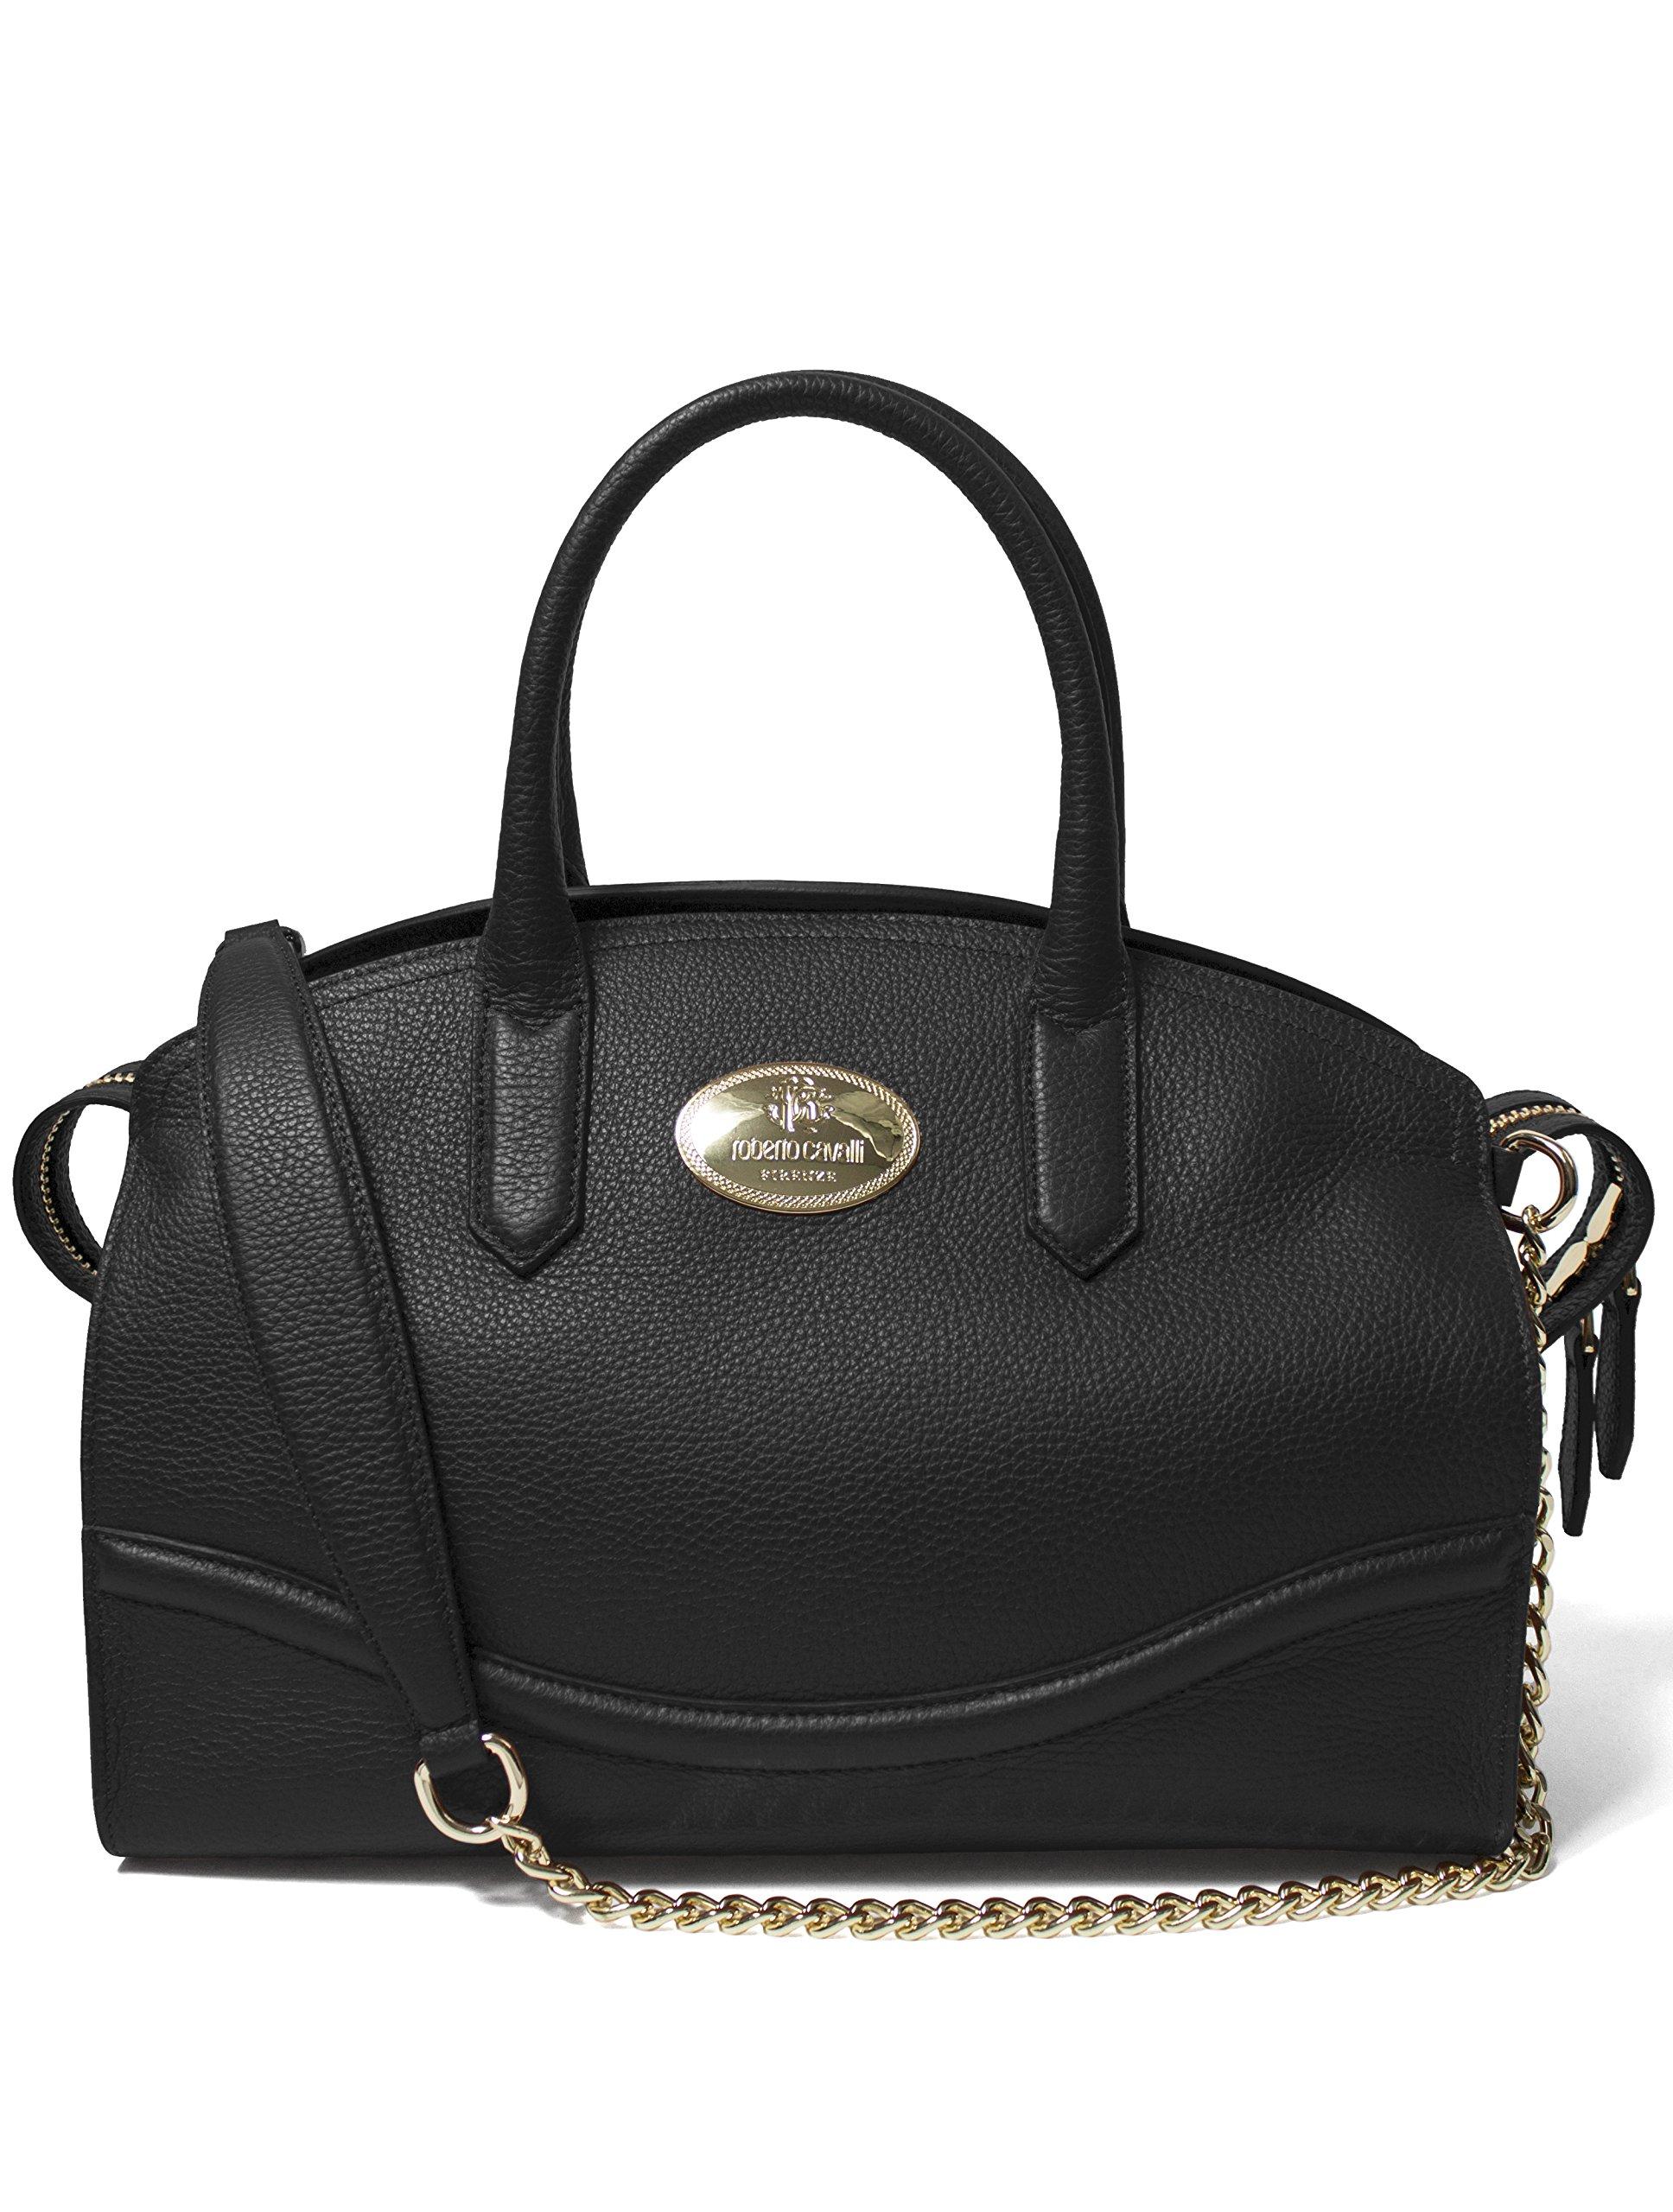 Roberto Cavalli Women's Leather Satchel Handbag Black